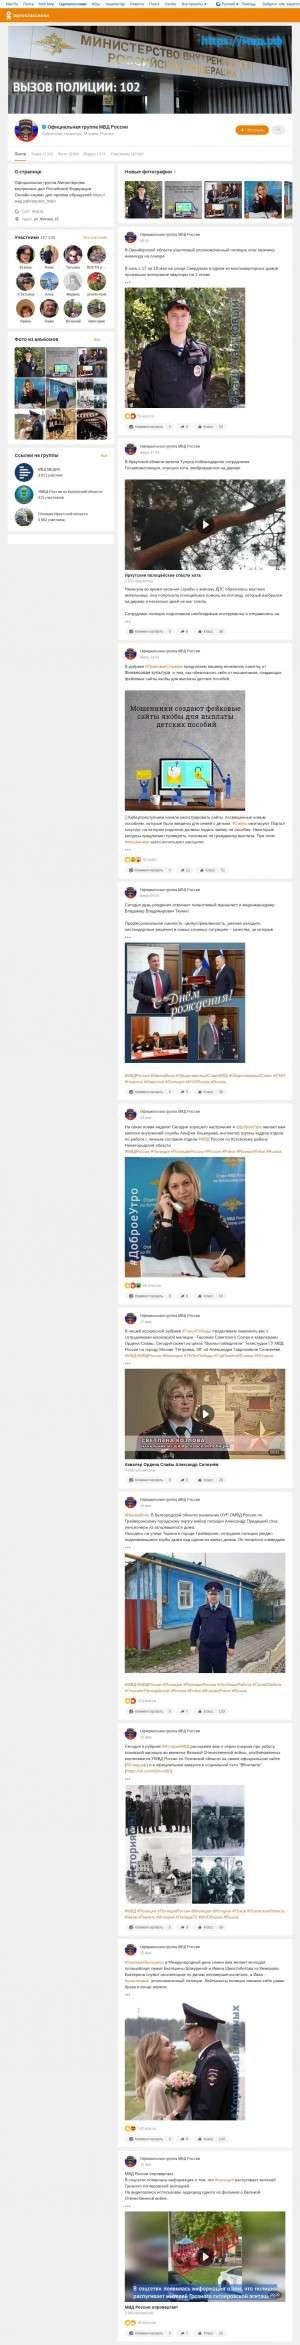 Предпросмотр для www.odnoklassniki.ru — Видновский отдел полиции